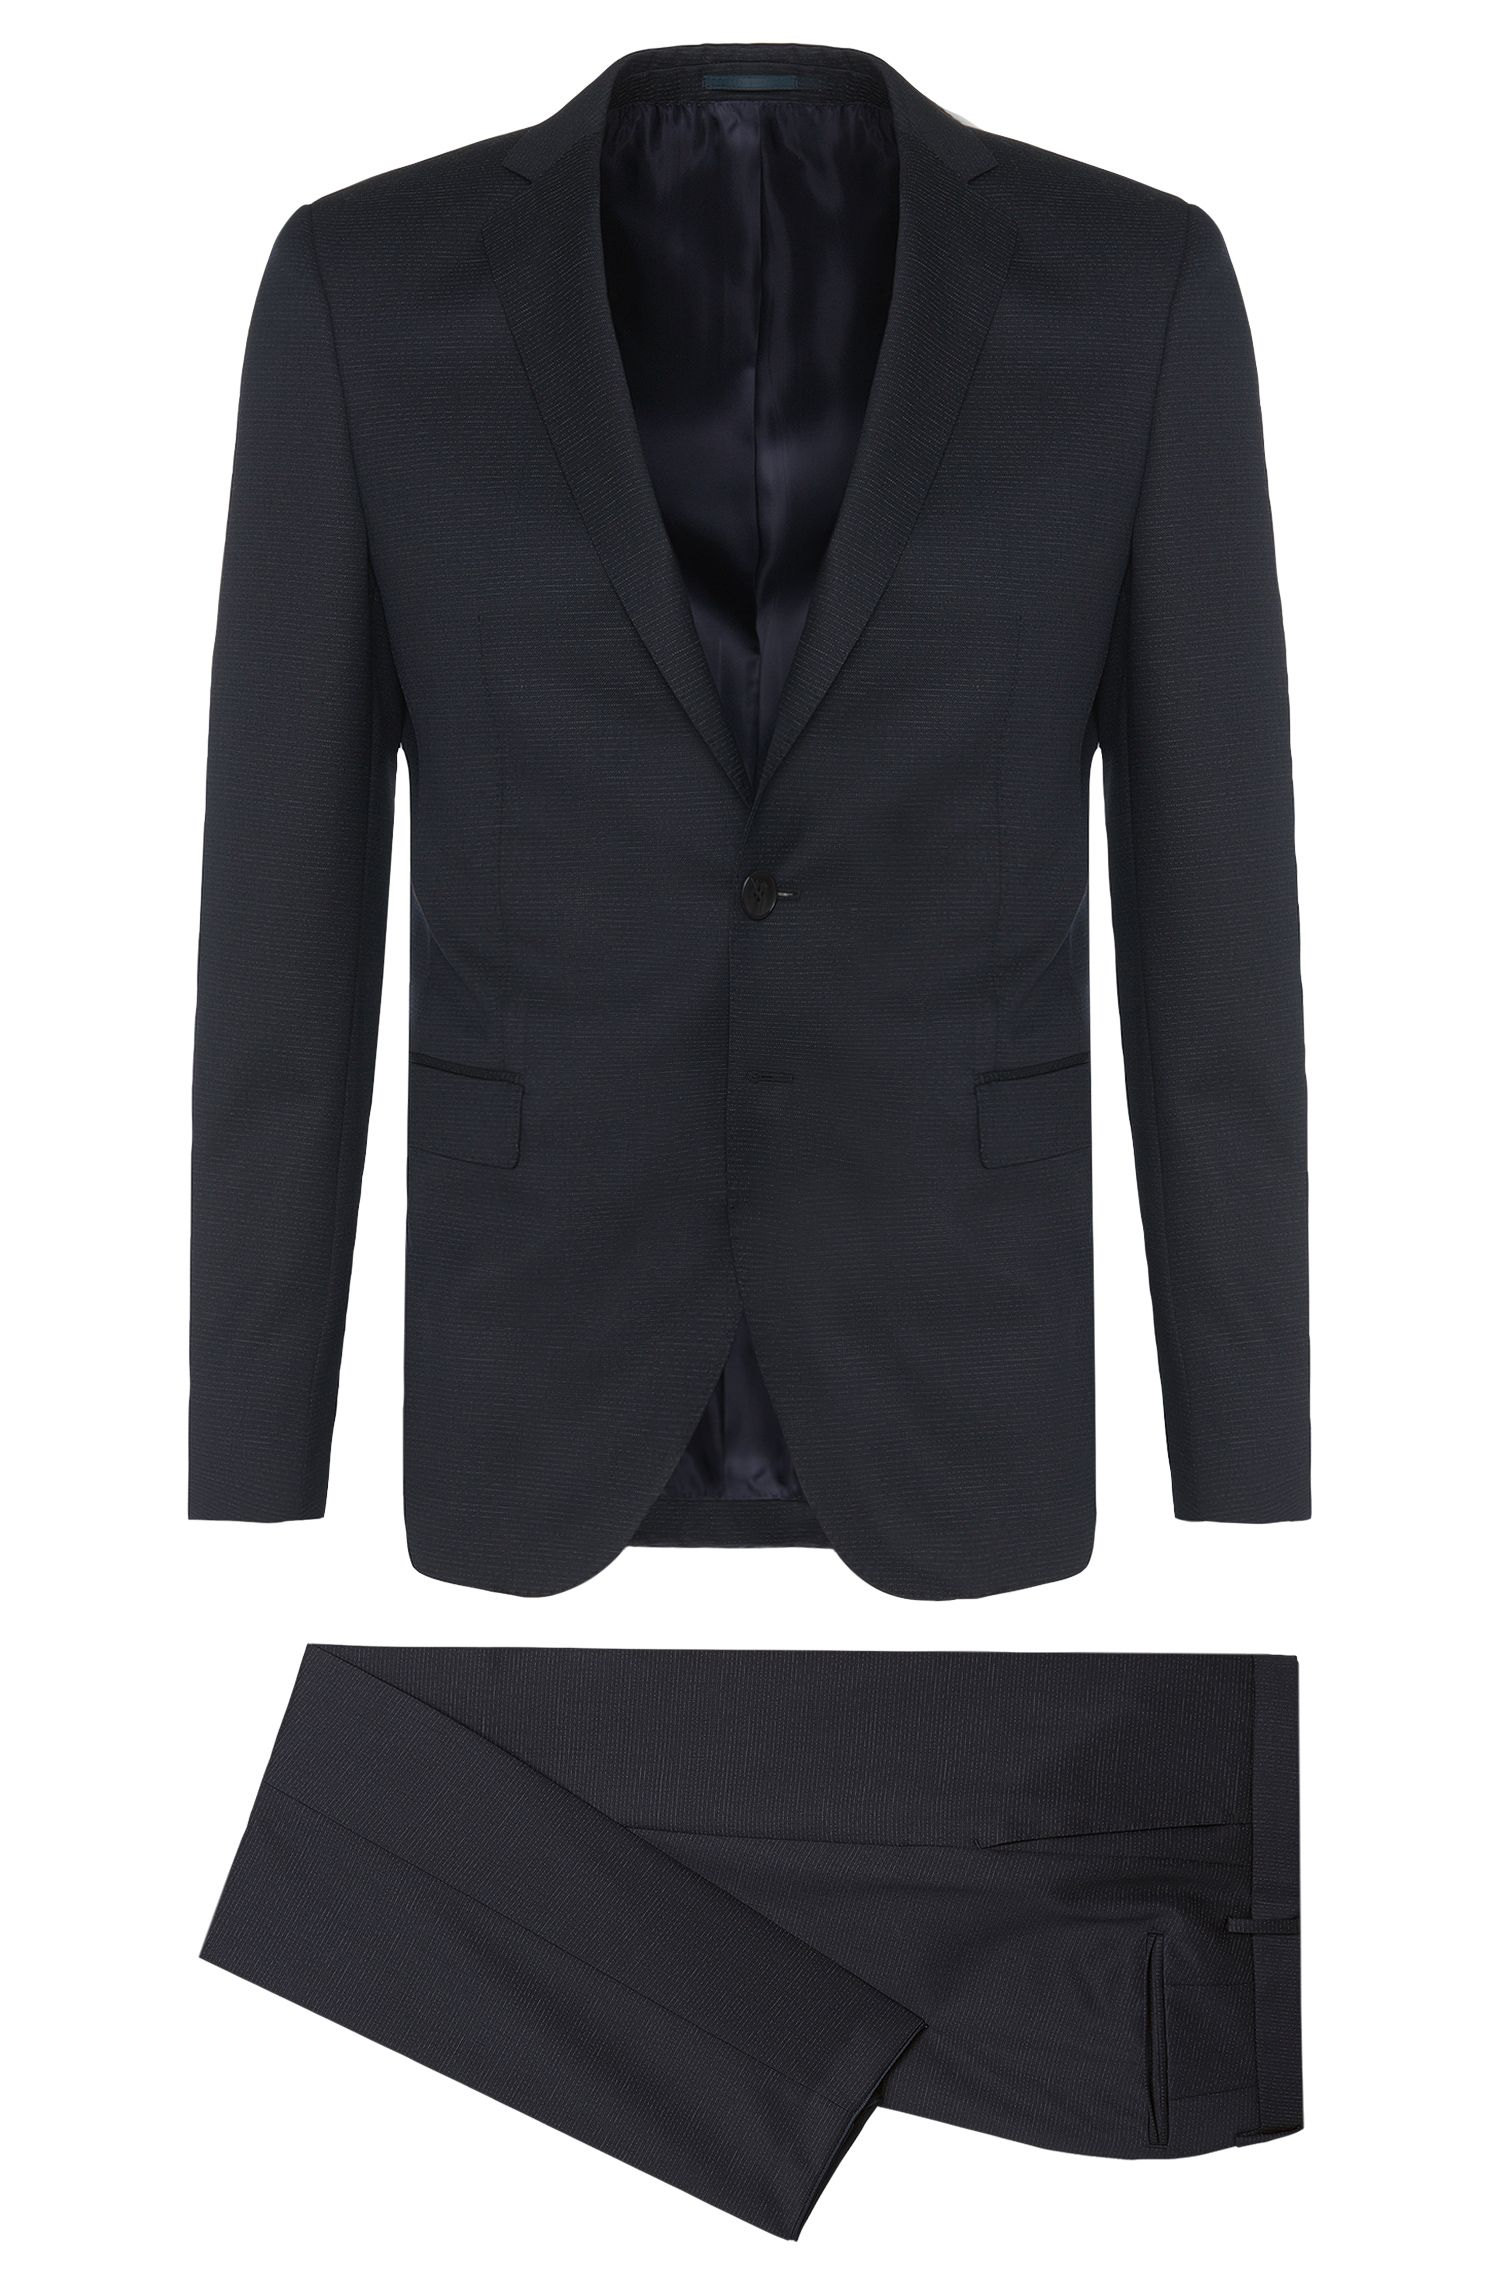 'Rocco/Wyatt' | Extra Slim Fit, Subtle Stripe Virgin Wool Suit